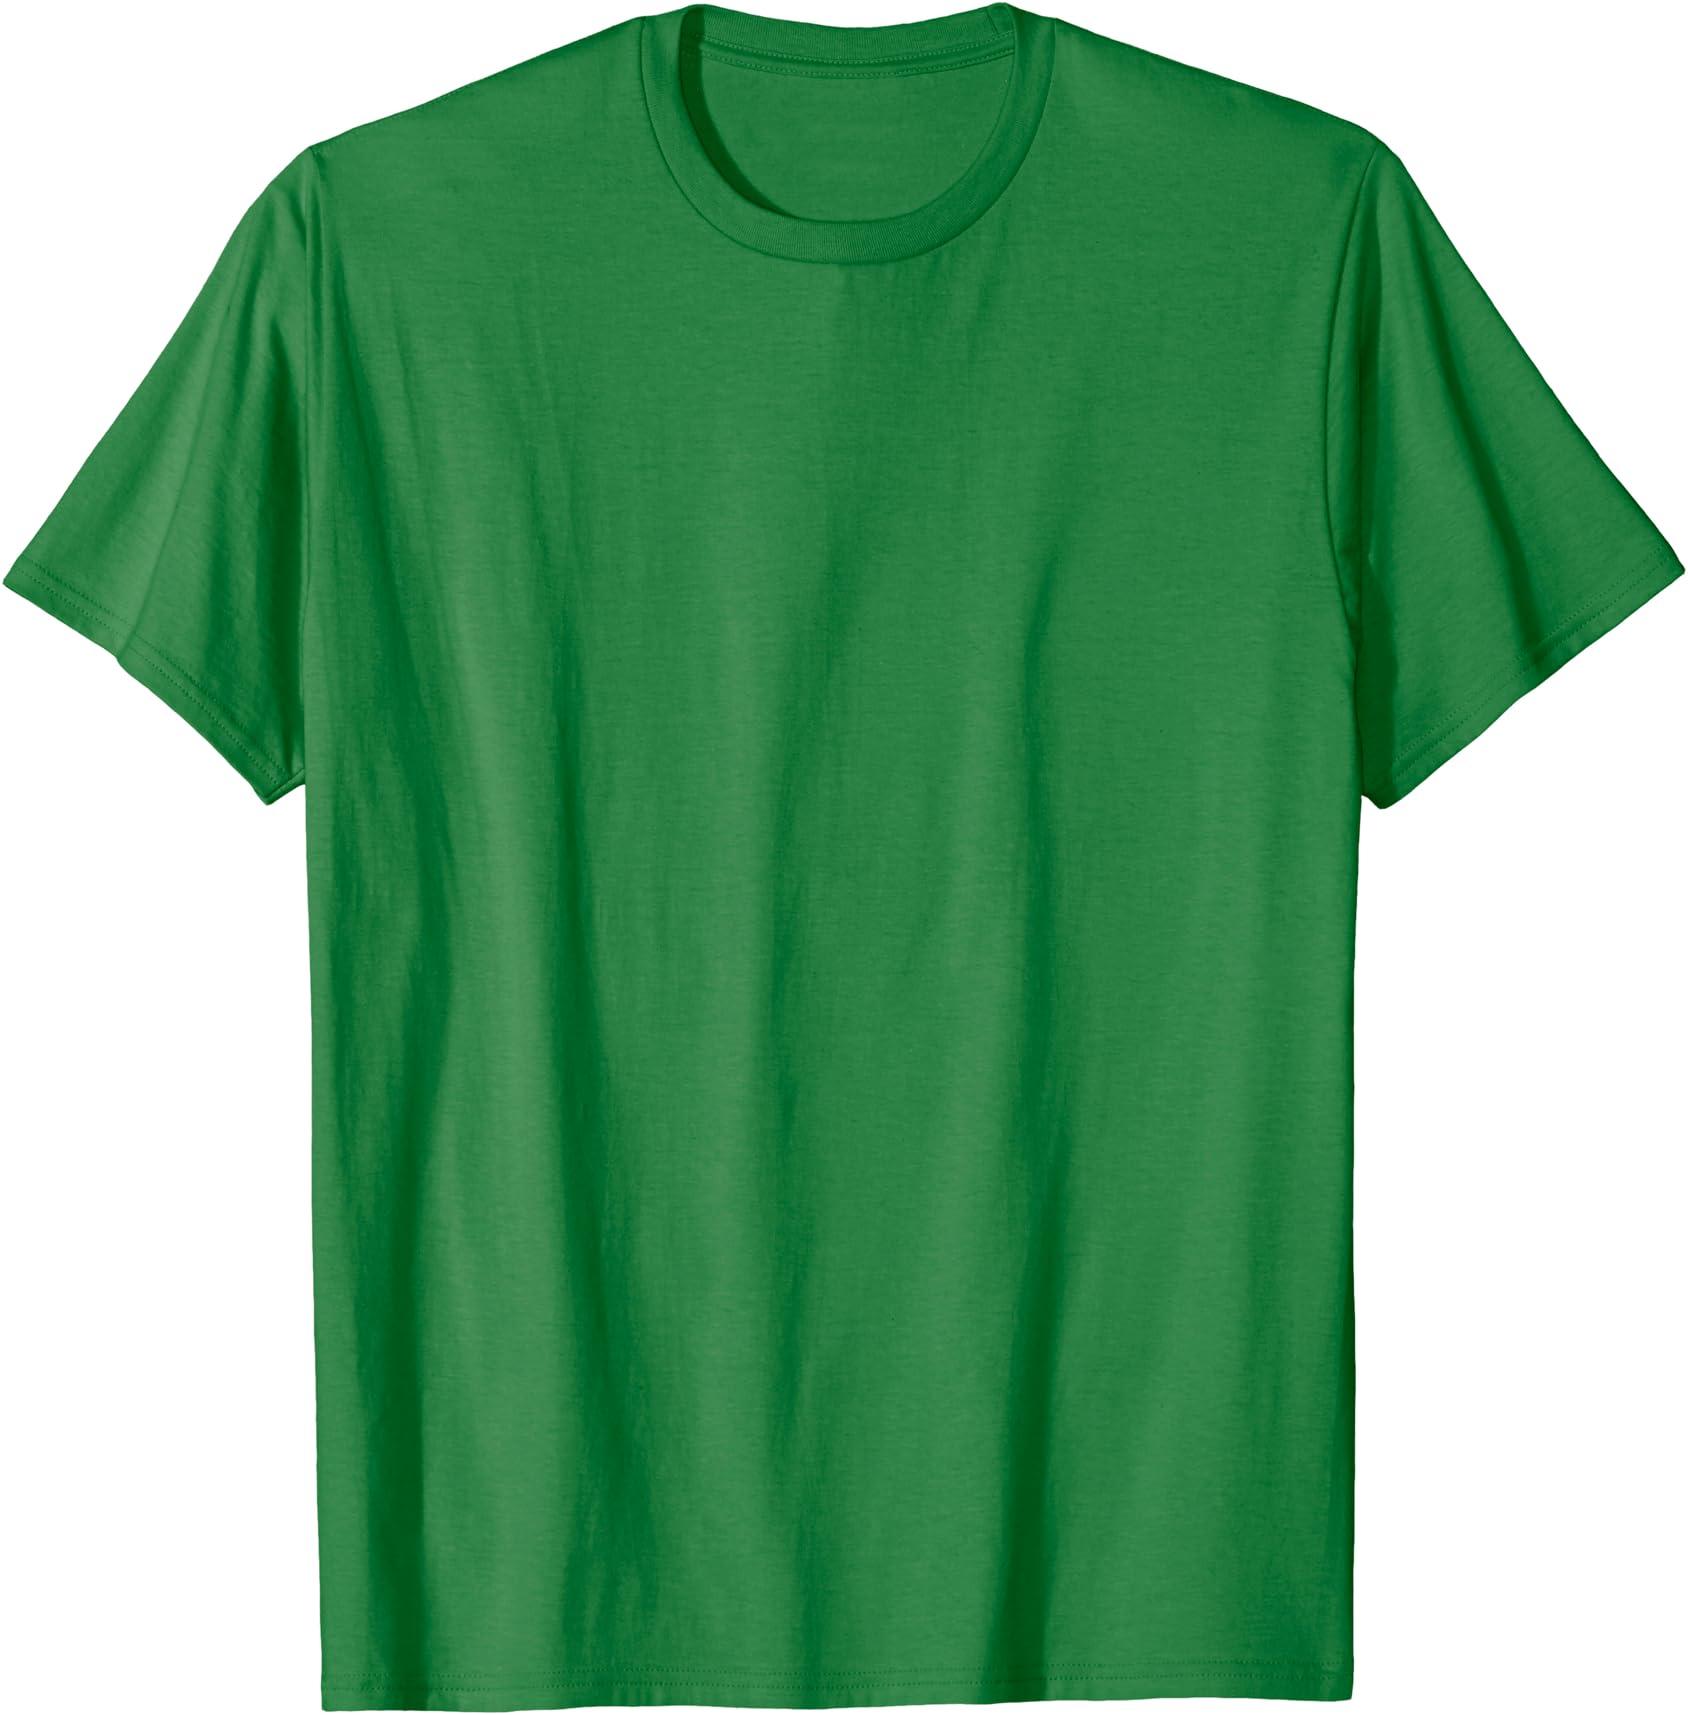 Sweatshirt Cool Apparel Shop Rub Me for Luck Im Irish